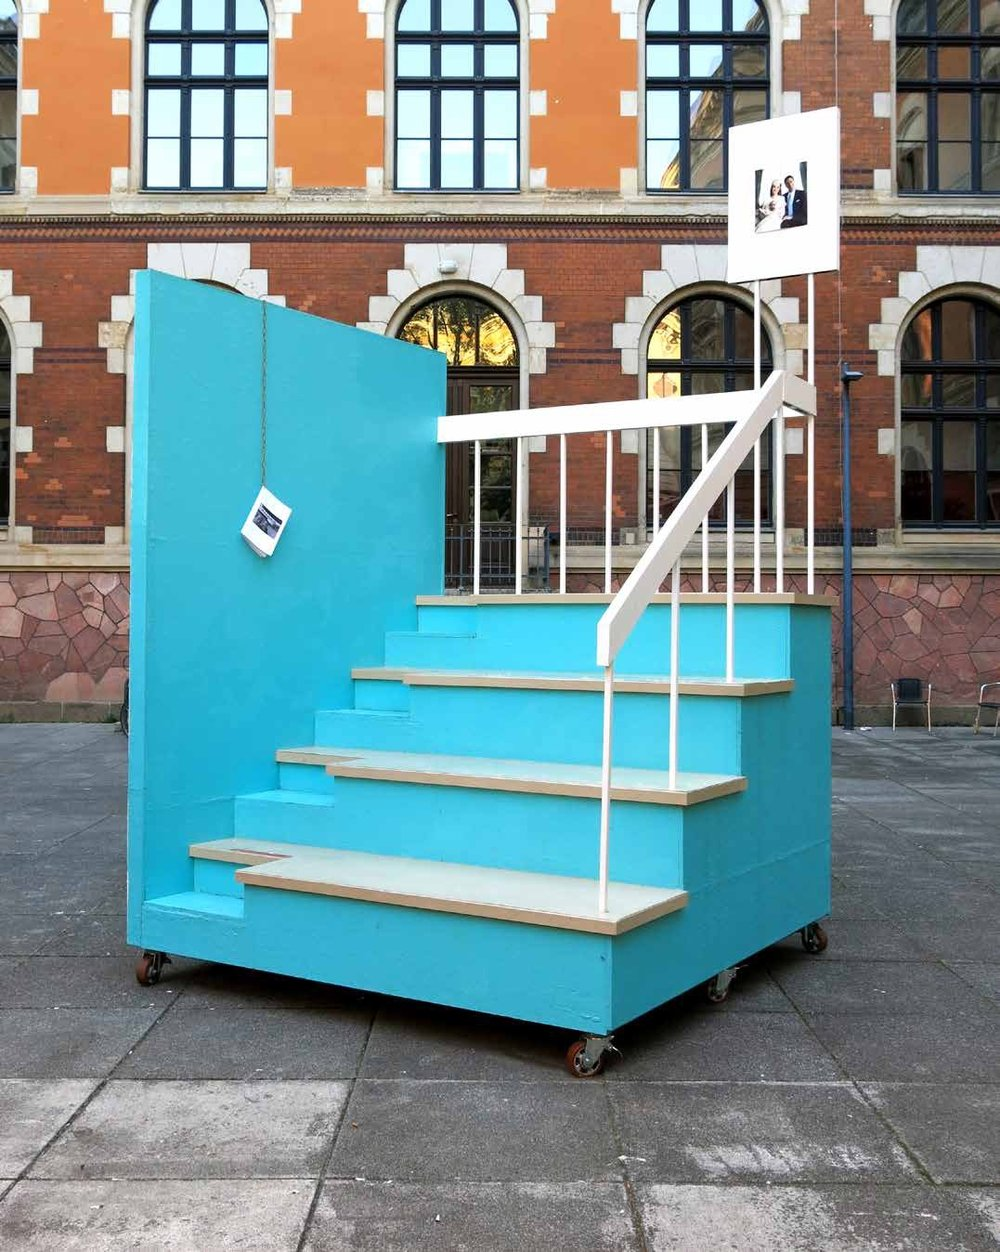 Installation view, ART N MORE LONDON, 2014, HBG, Leipzig